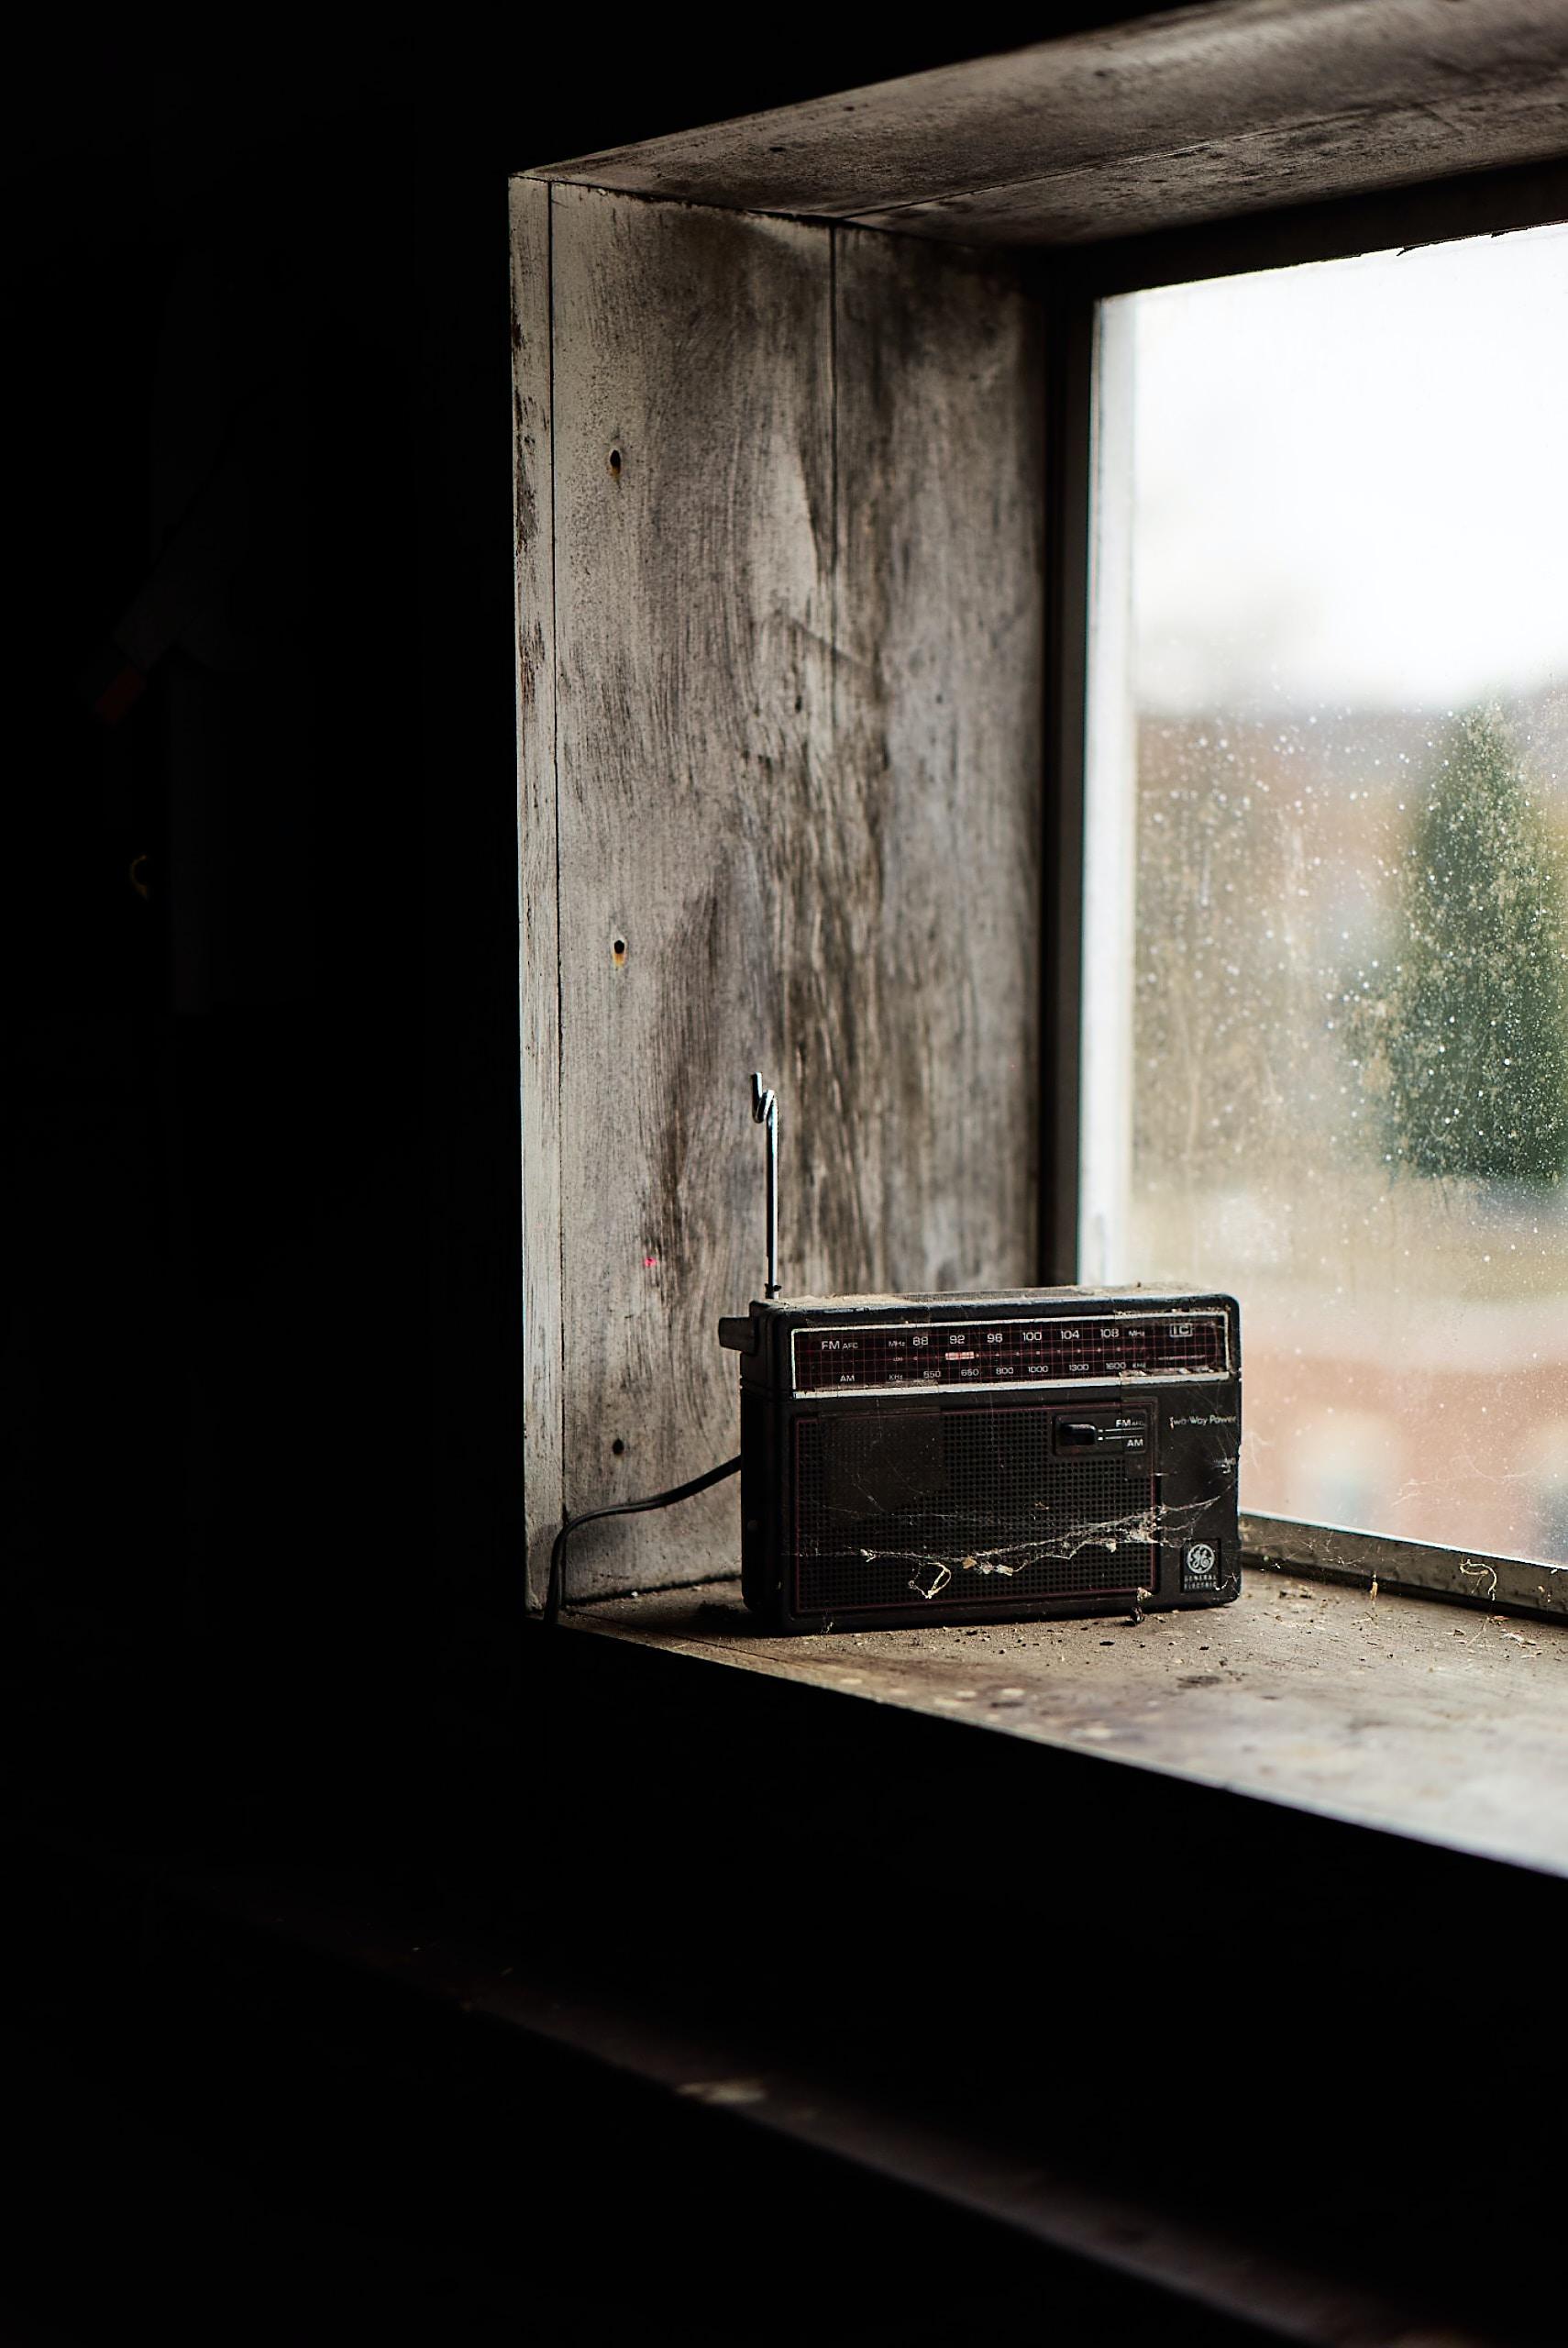 black boombox radio on top window